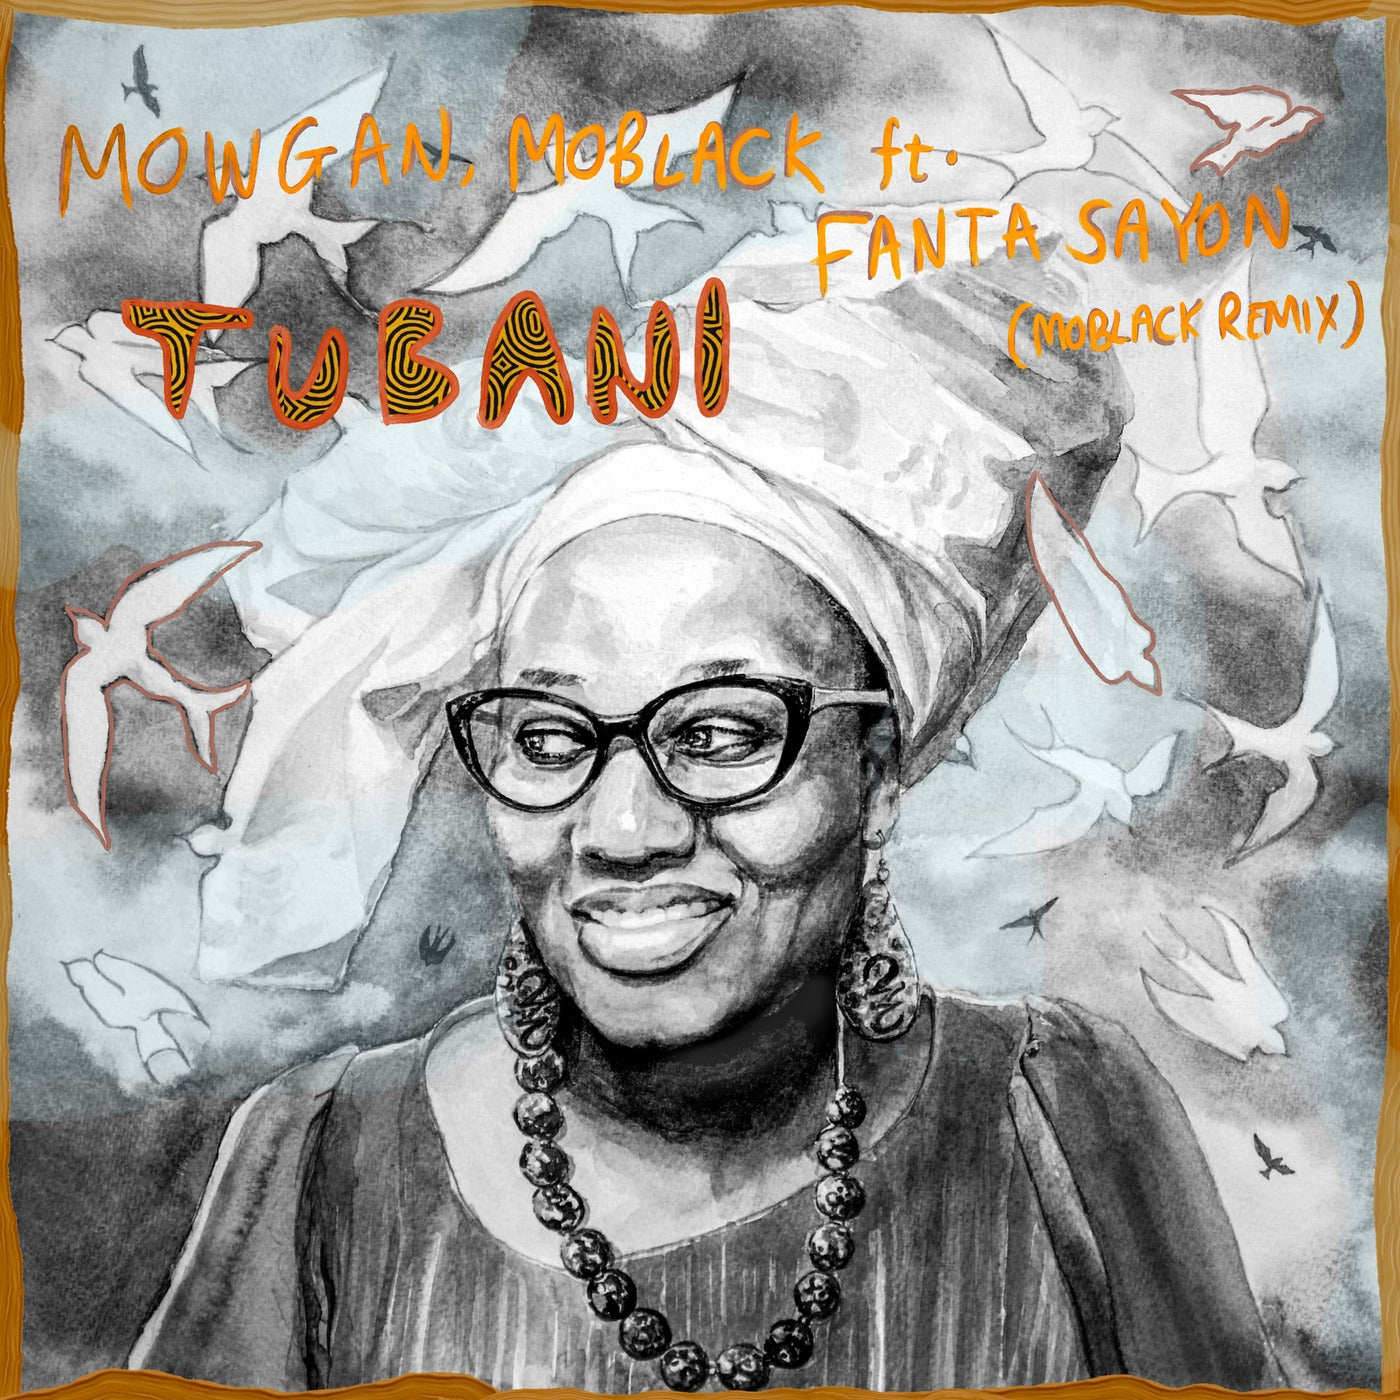 Tubani feat. Fanta Sayon (MoBlack Remix)